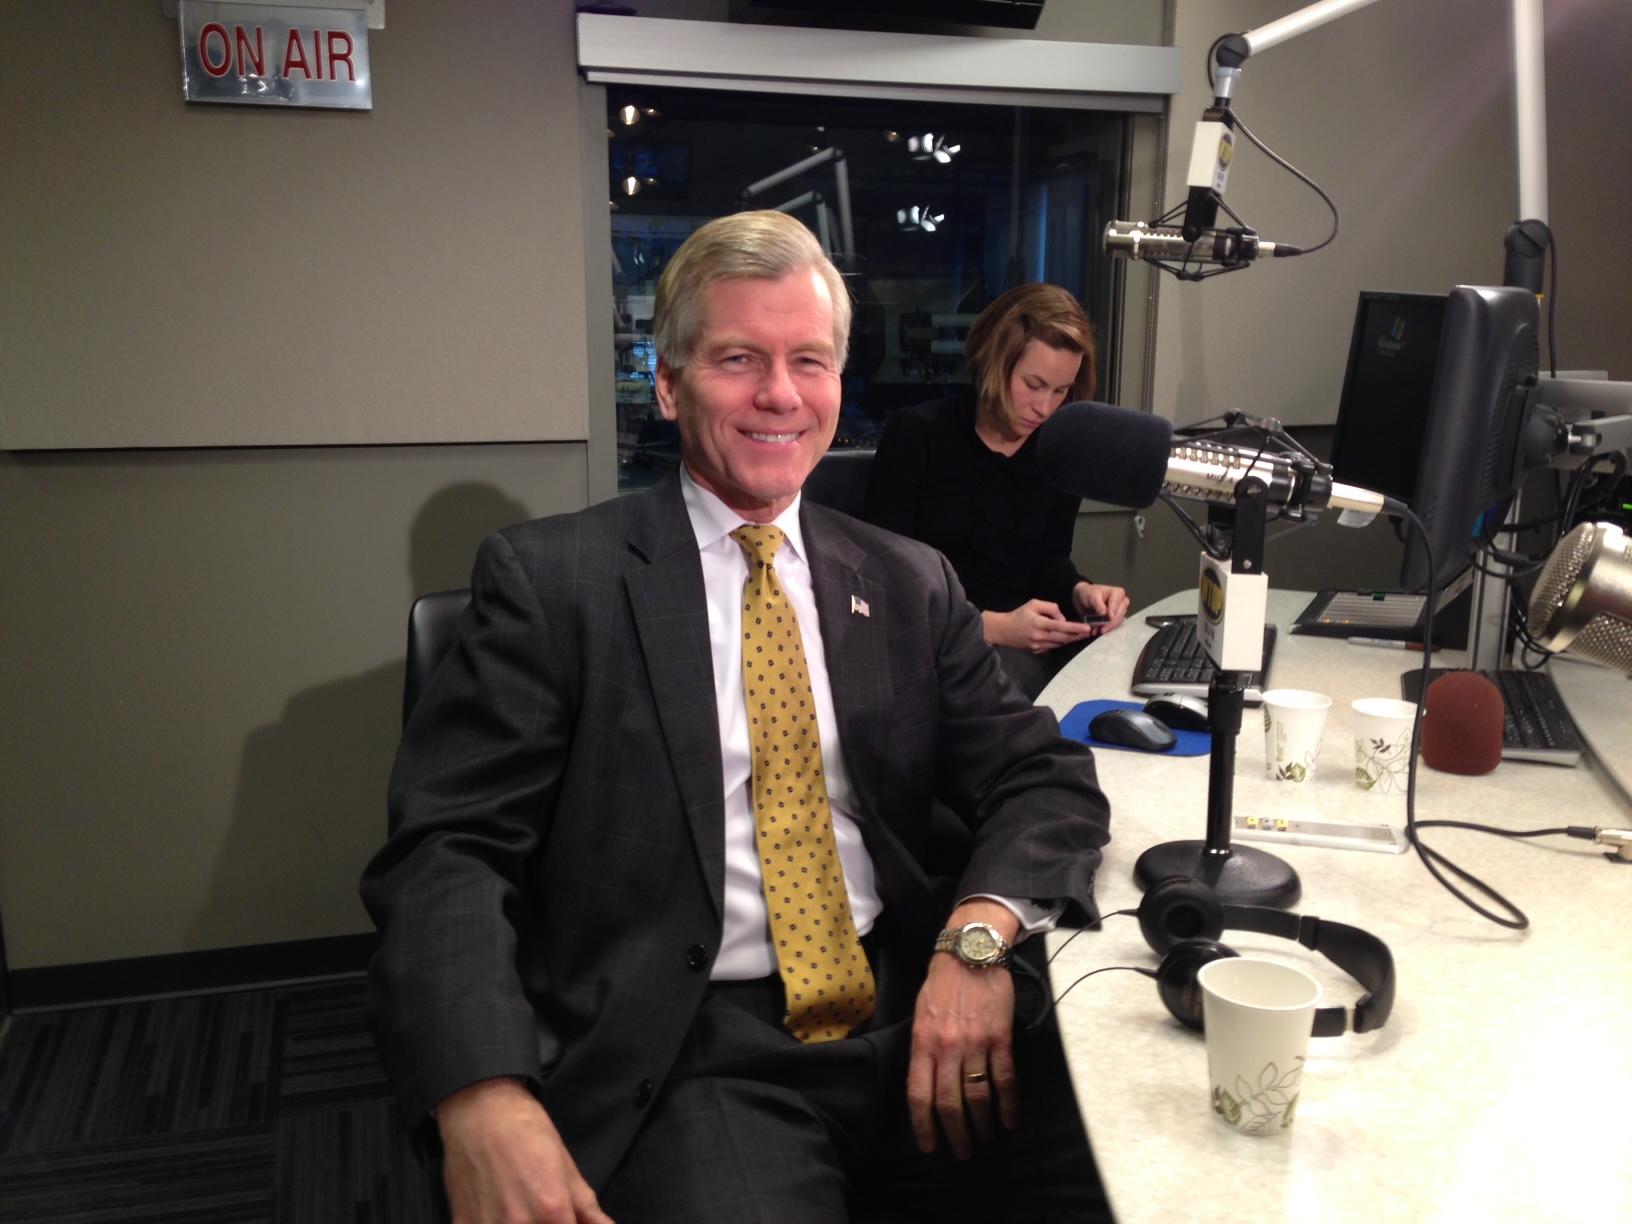 Va. Gov. Bob McDonnell offers advice to Terry McAuliffe